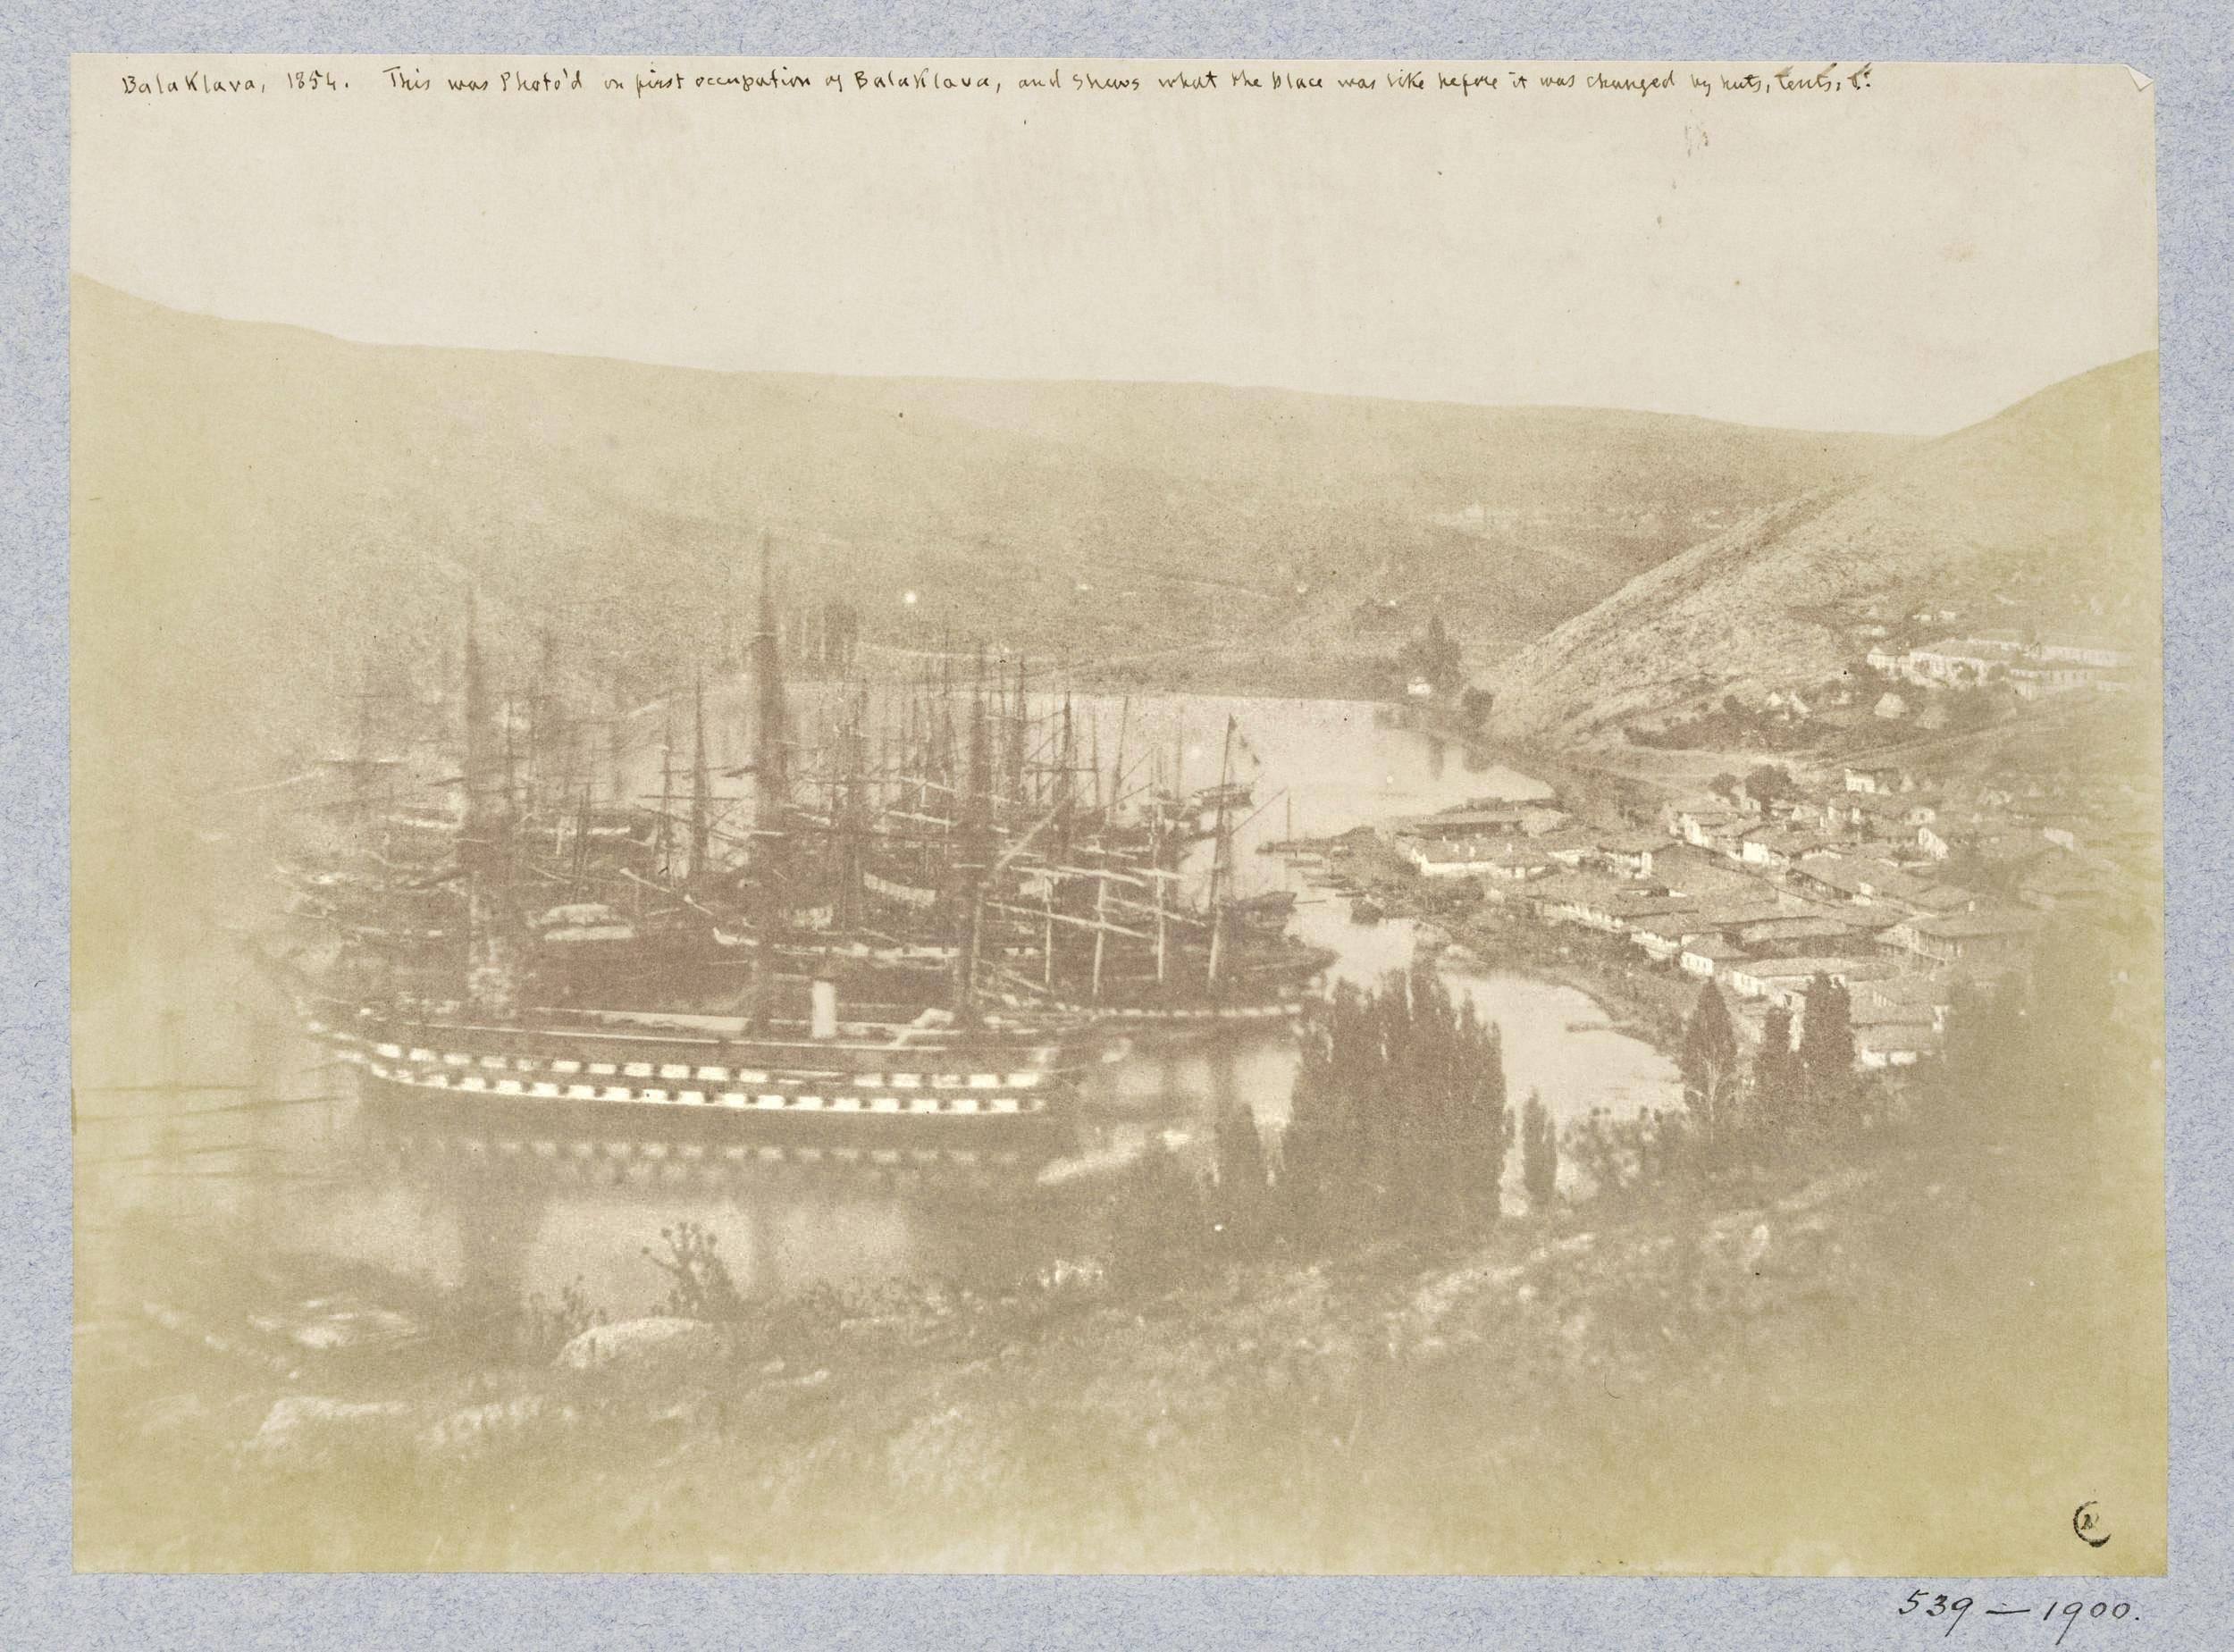 Самая ранняя фотография Балаклавы. 1854